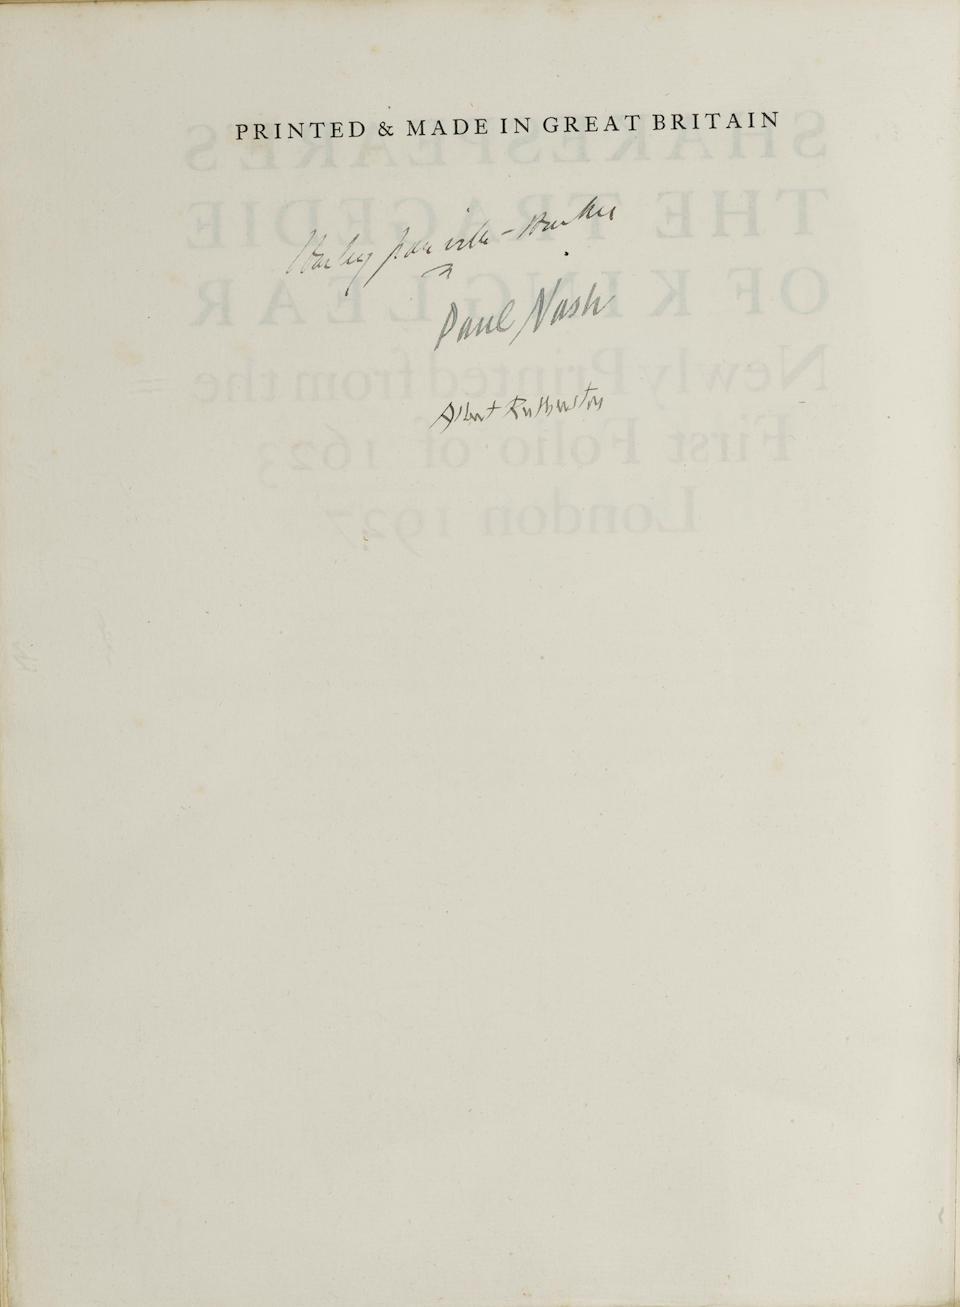 SHAKESPEARE, WILLIAM. 1564-1616. The Players' Shakespeare. Stratford-upon-Avon: The Shakespeare Head Press, 1923-1927.